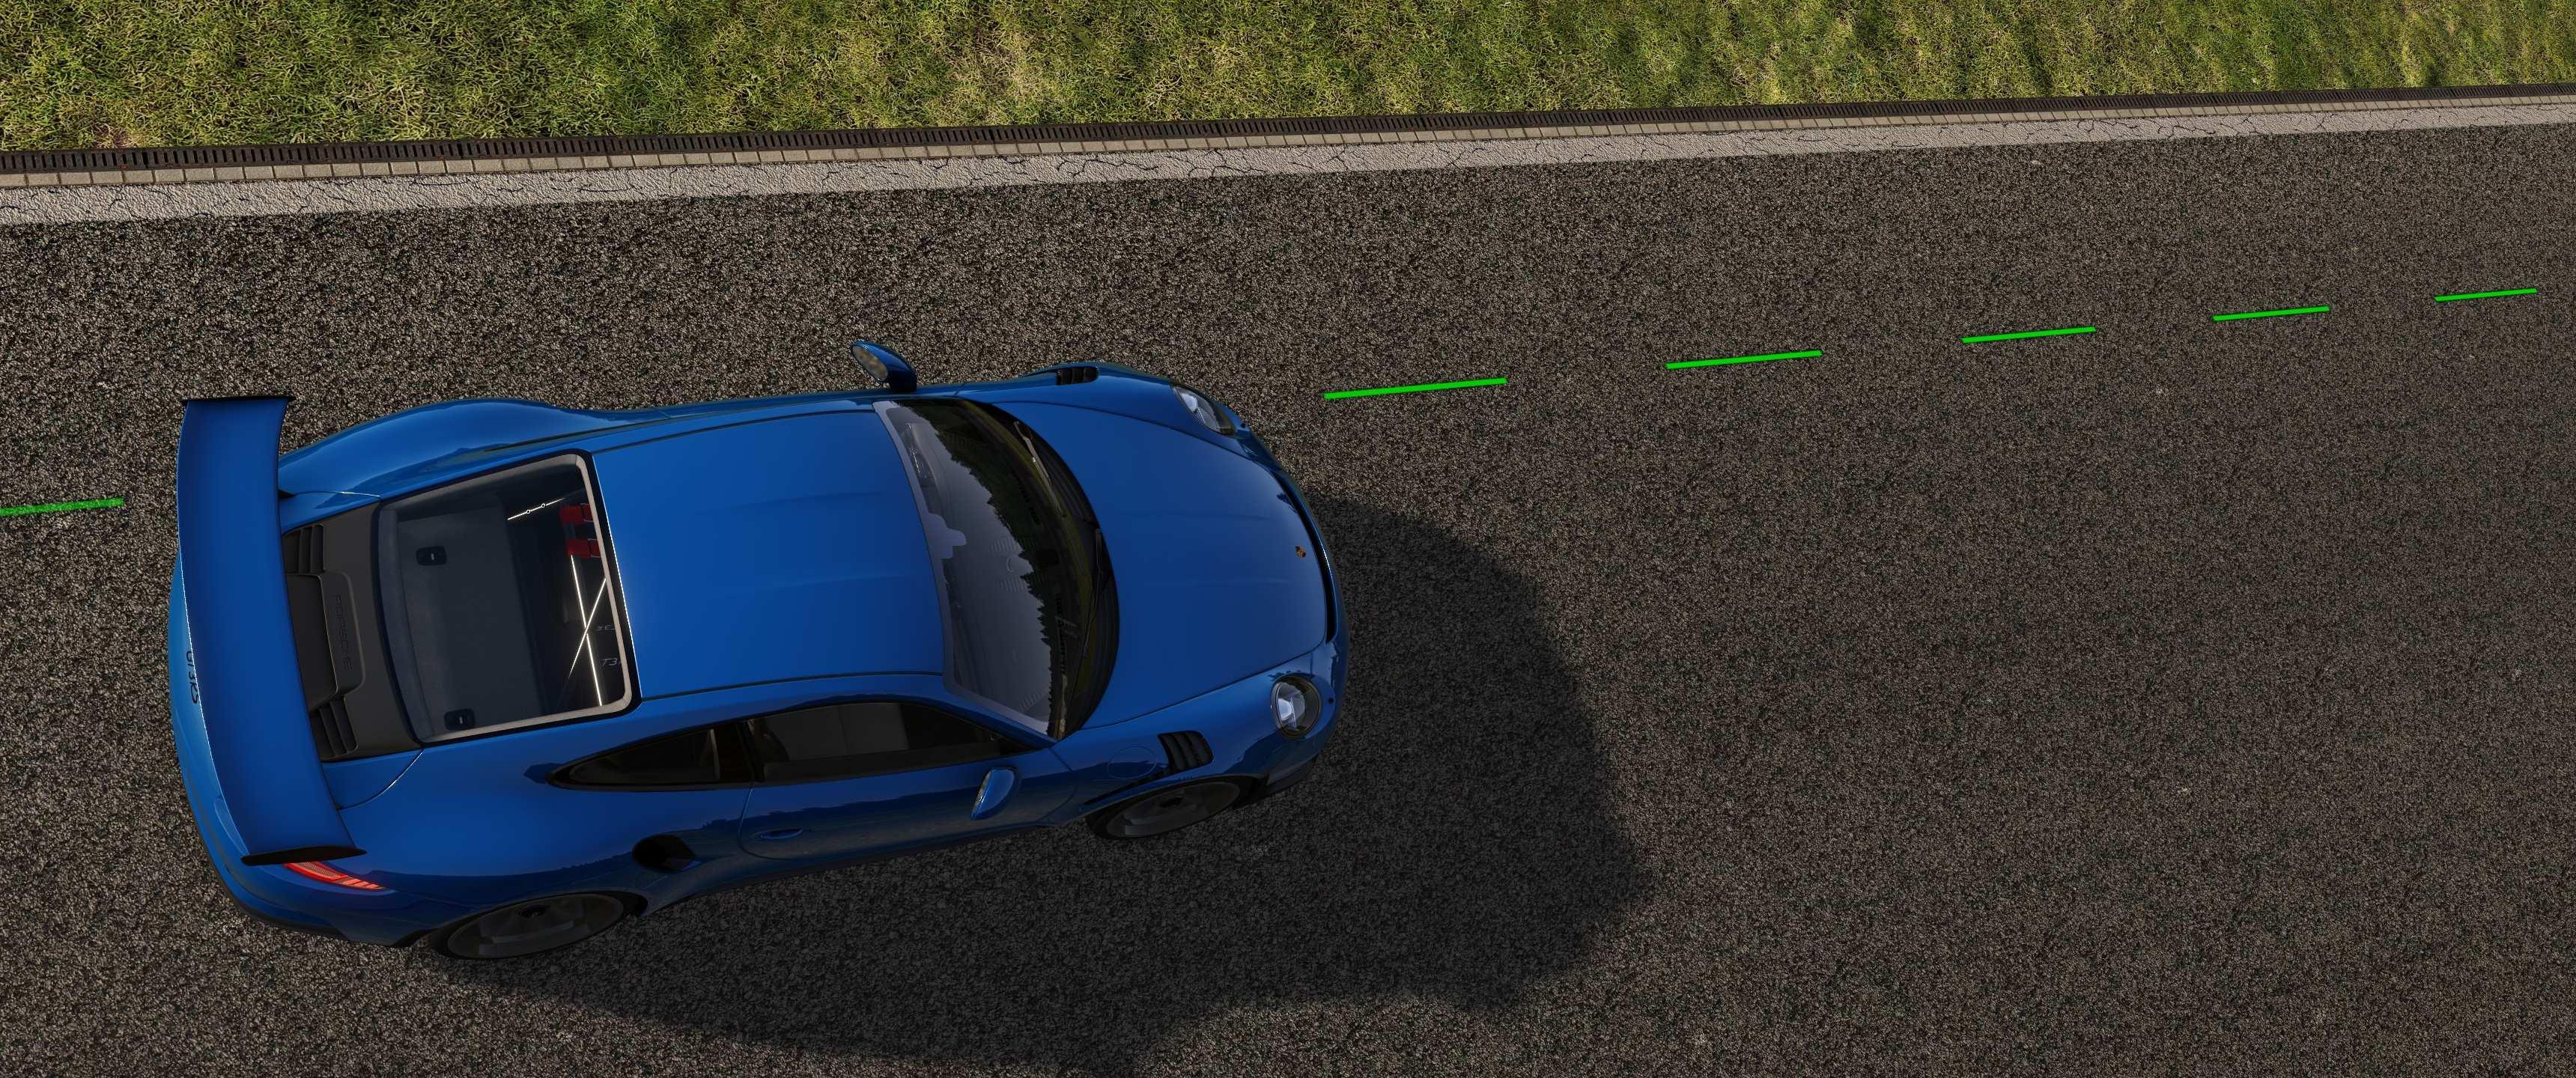 Screenshot_ks_porsche_911_gt3_rs_ks_nurburgring_24-9-117-13-26-49.jpg